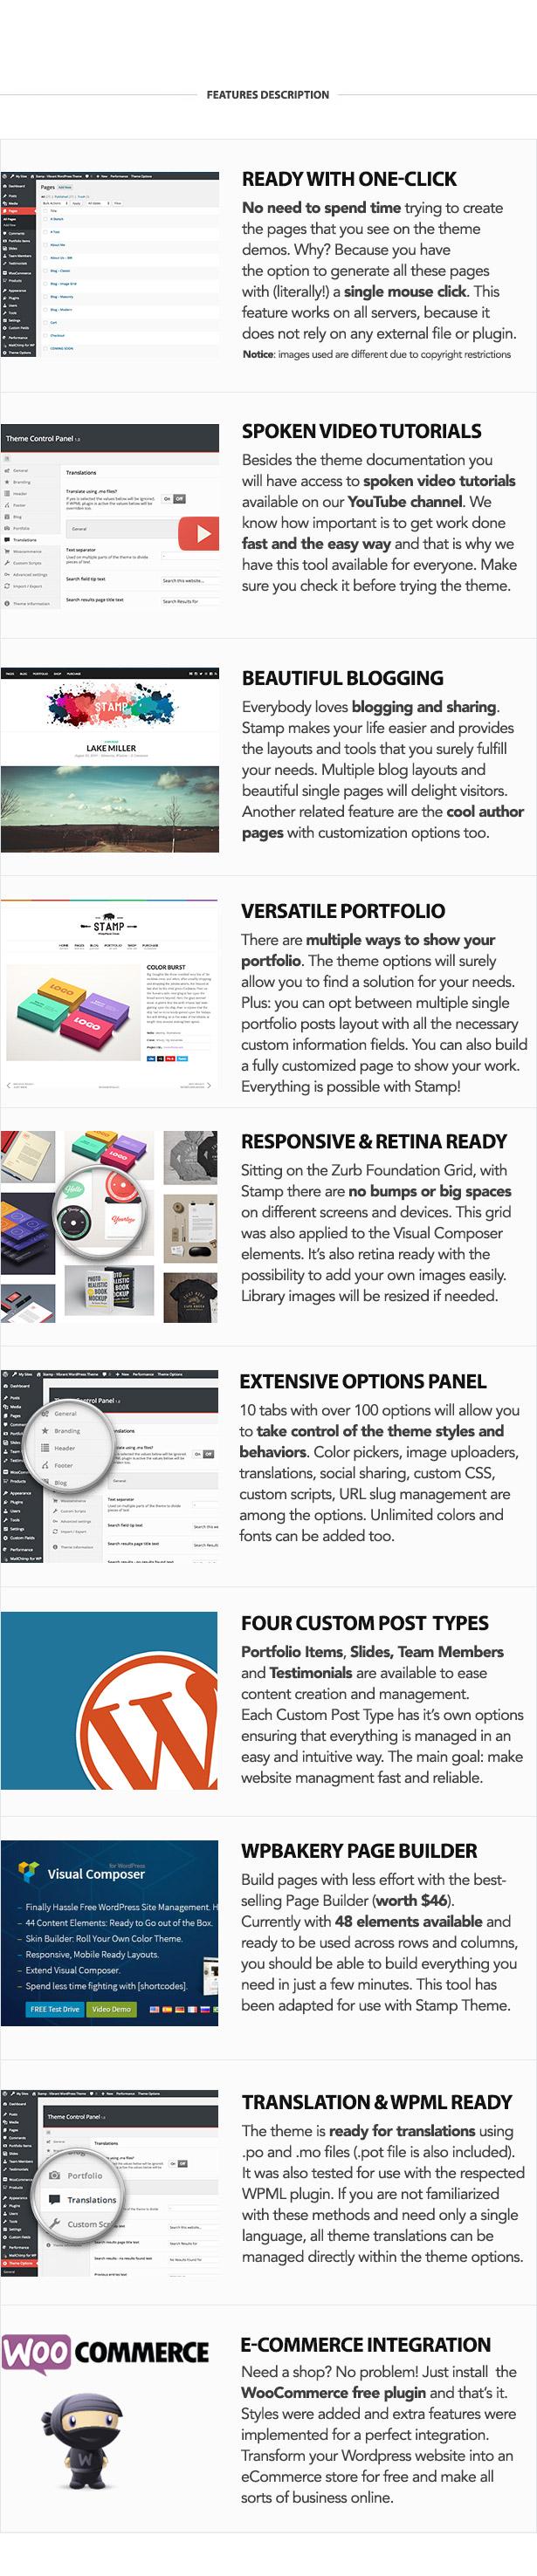 Stamp - Vibrant WordPress Theme - 3